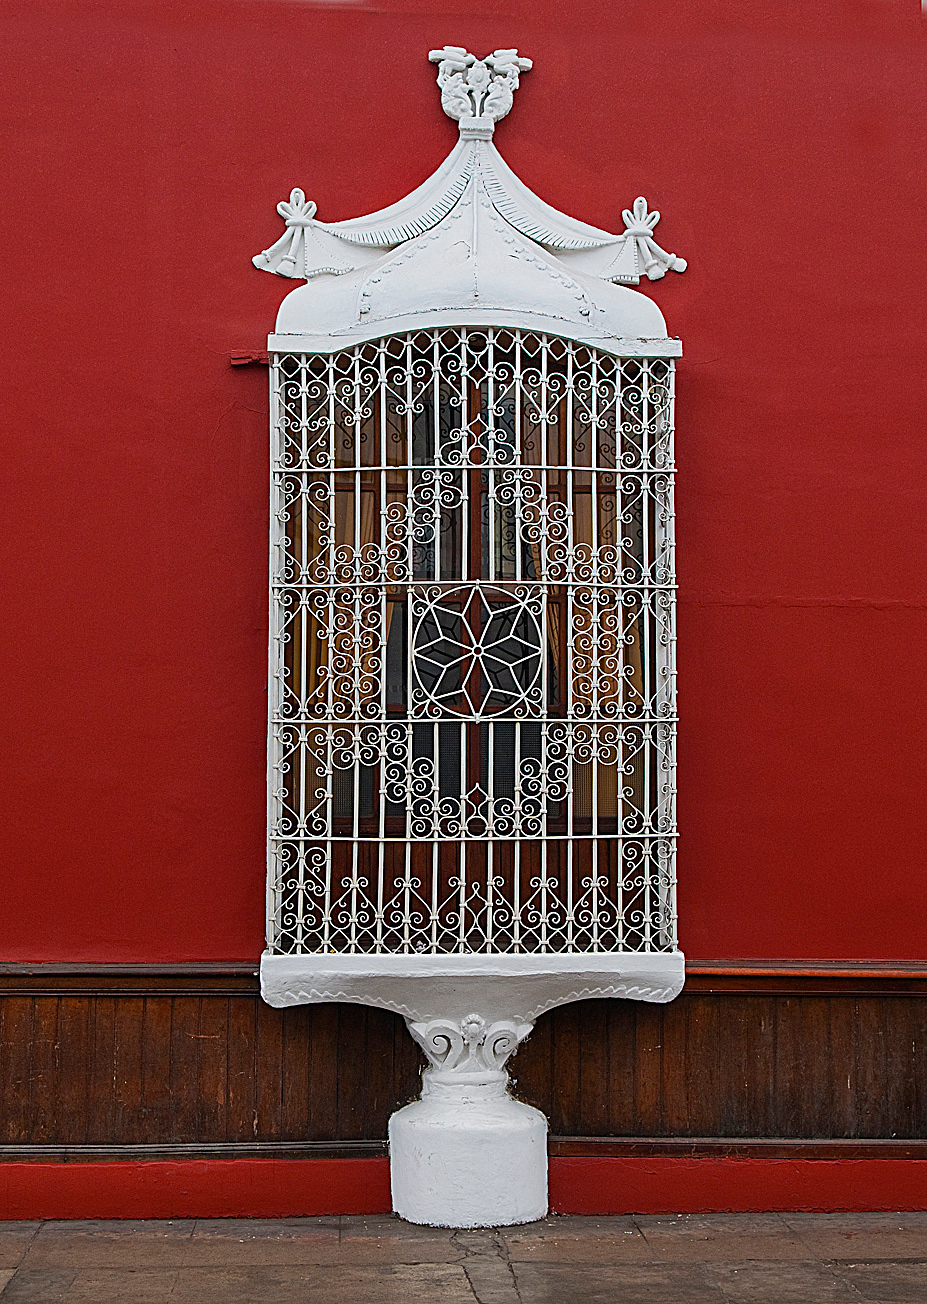 "<p><font size=""4"" face=""Trajan Pro""> Ventanas Coloniales - Trujillo</font></p>"